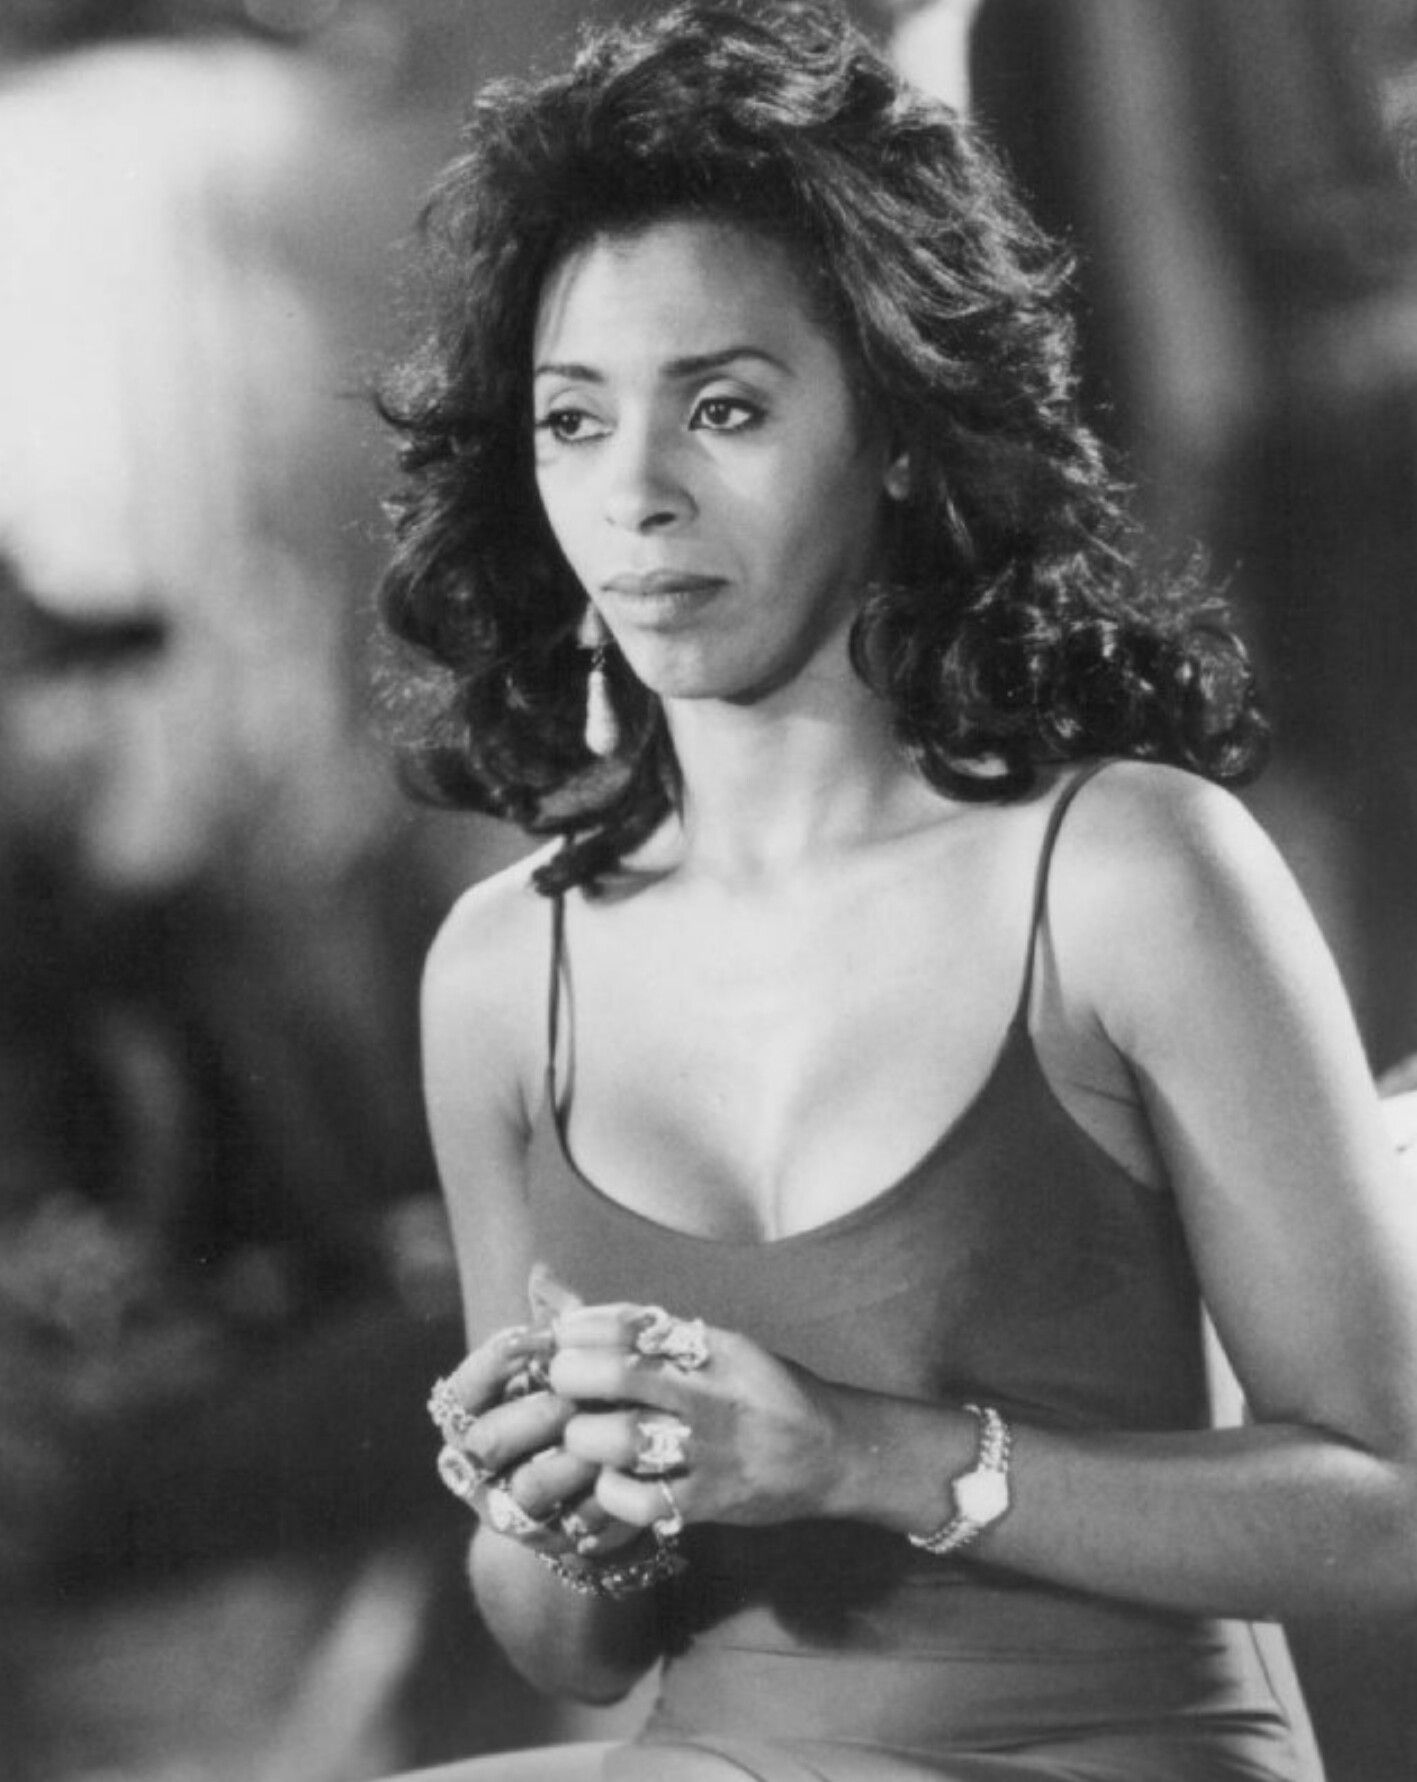 Afton Williamson,Mirella D'Angelo Erotic pictures Clark Johnson,Penni Gray